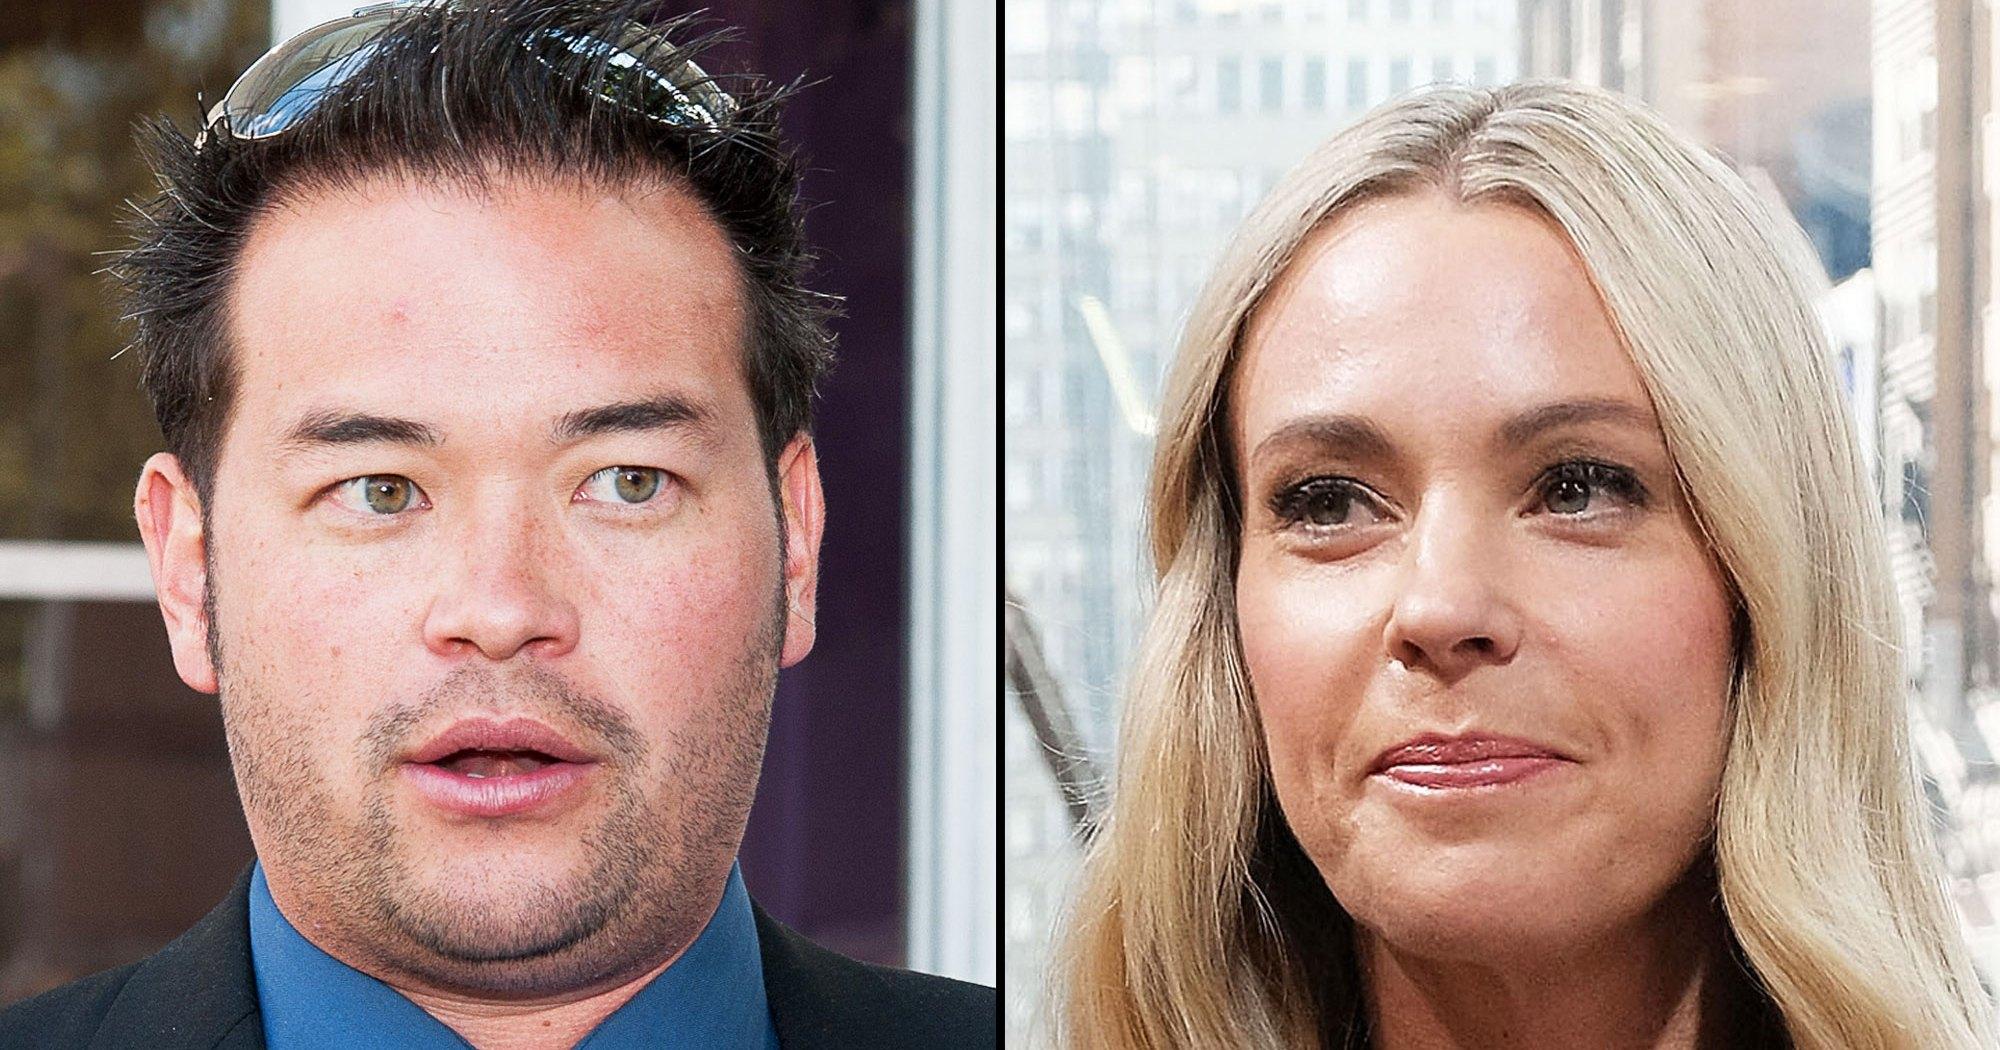 Jon Gosselin Claims Kate Has 'Zero' Interaction With Son Collin